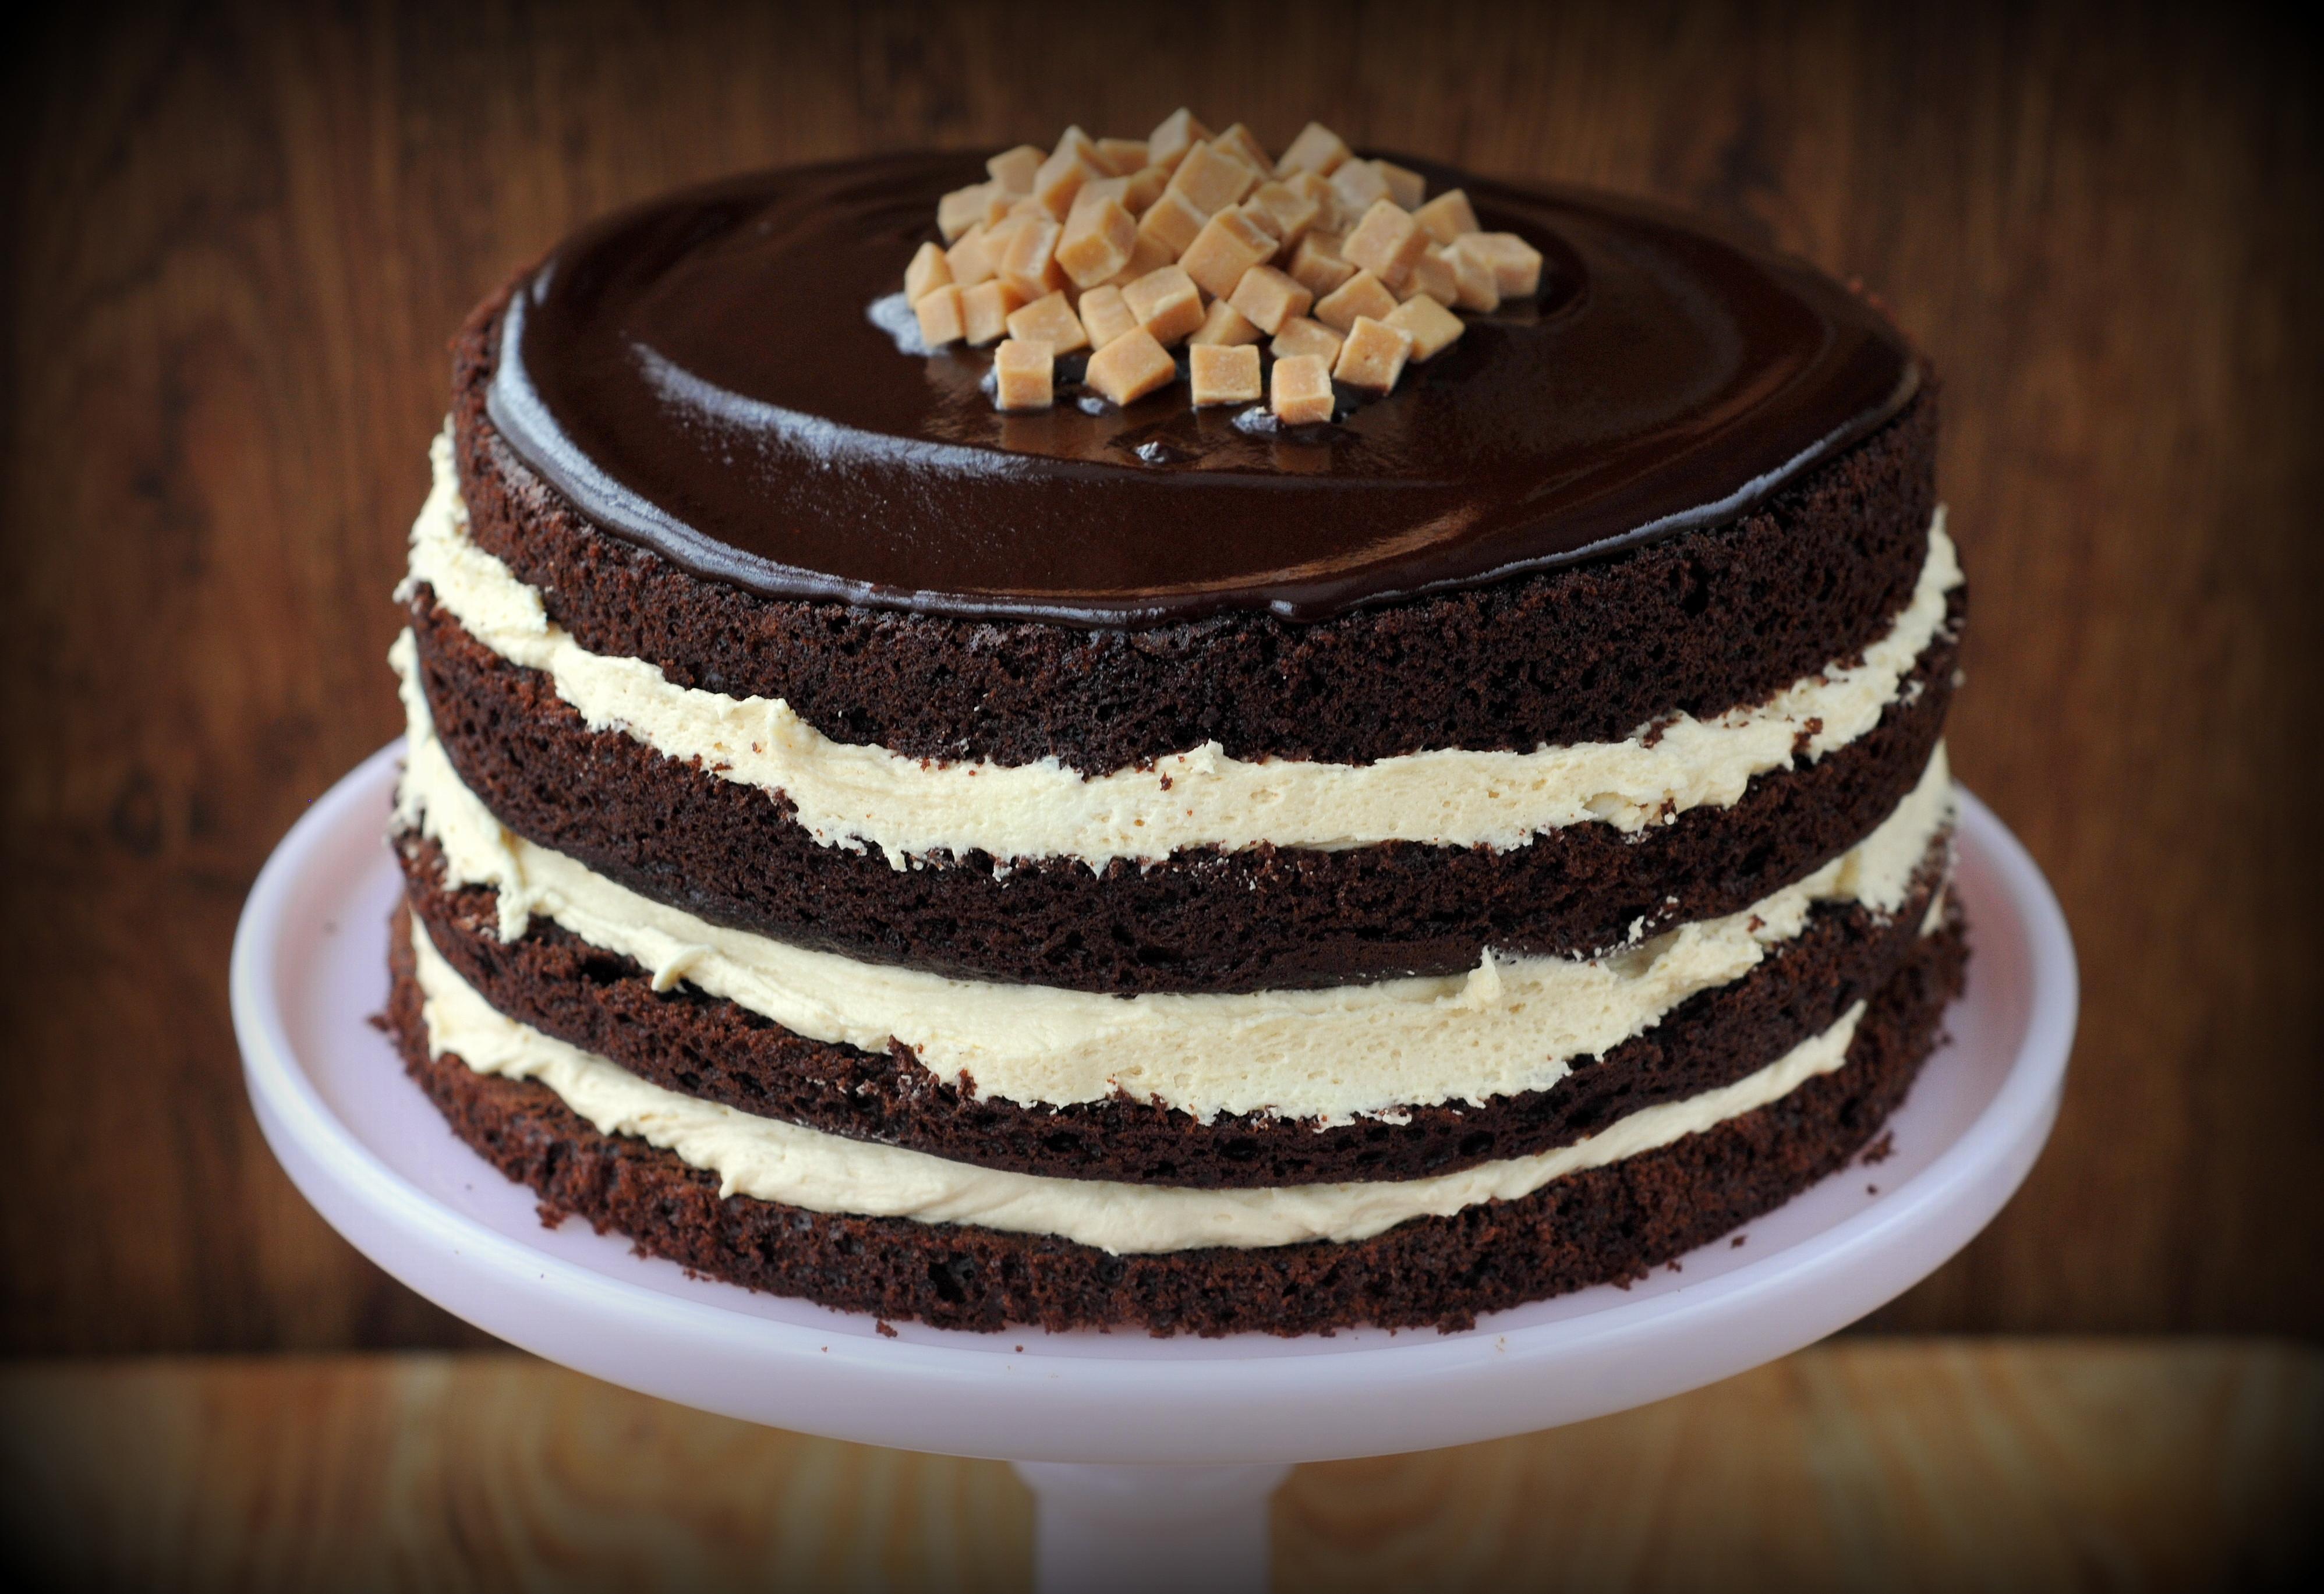 Salted Caramel Chocolate Cake  Salted Caramel Chocolate Fudge Cake Ren Behan